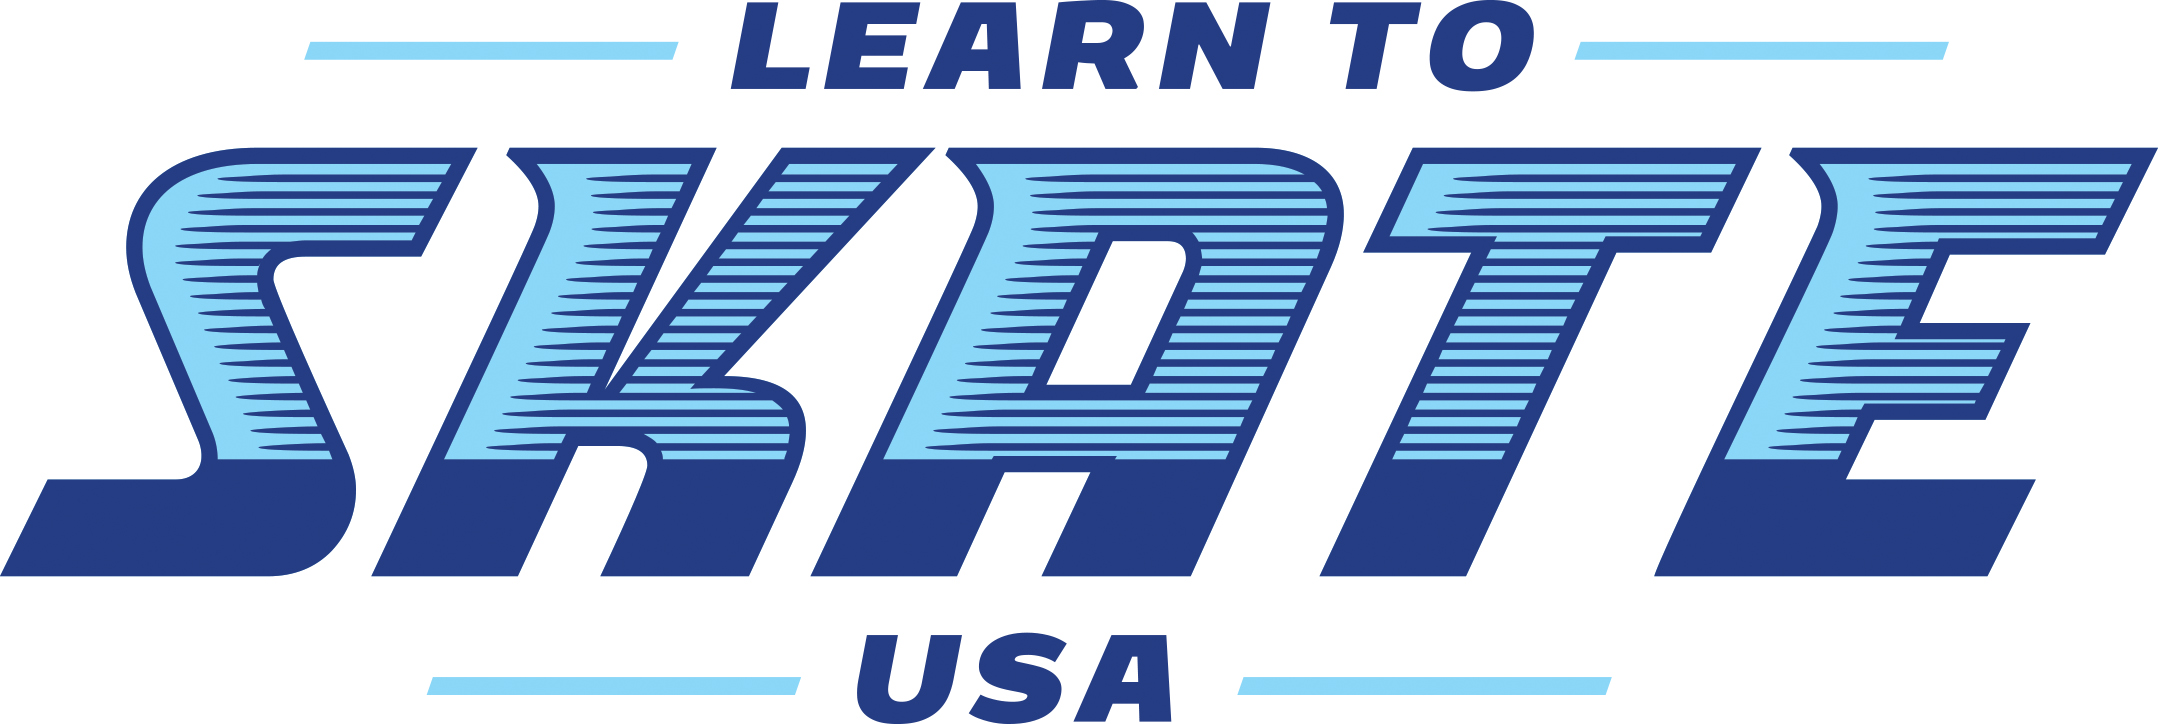 lts logo.jpg